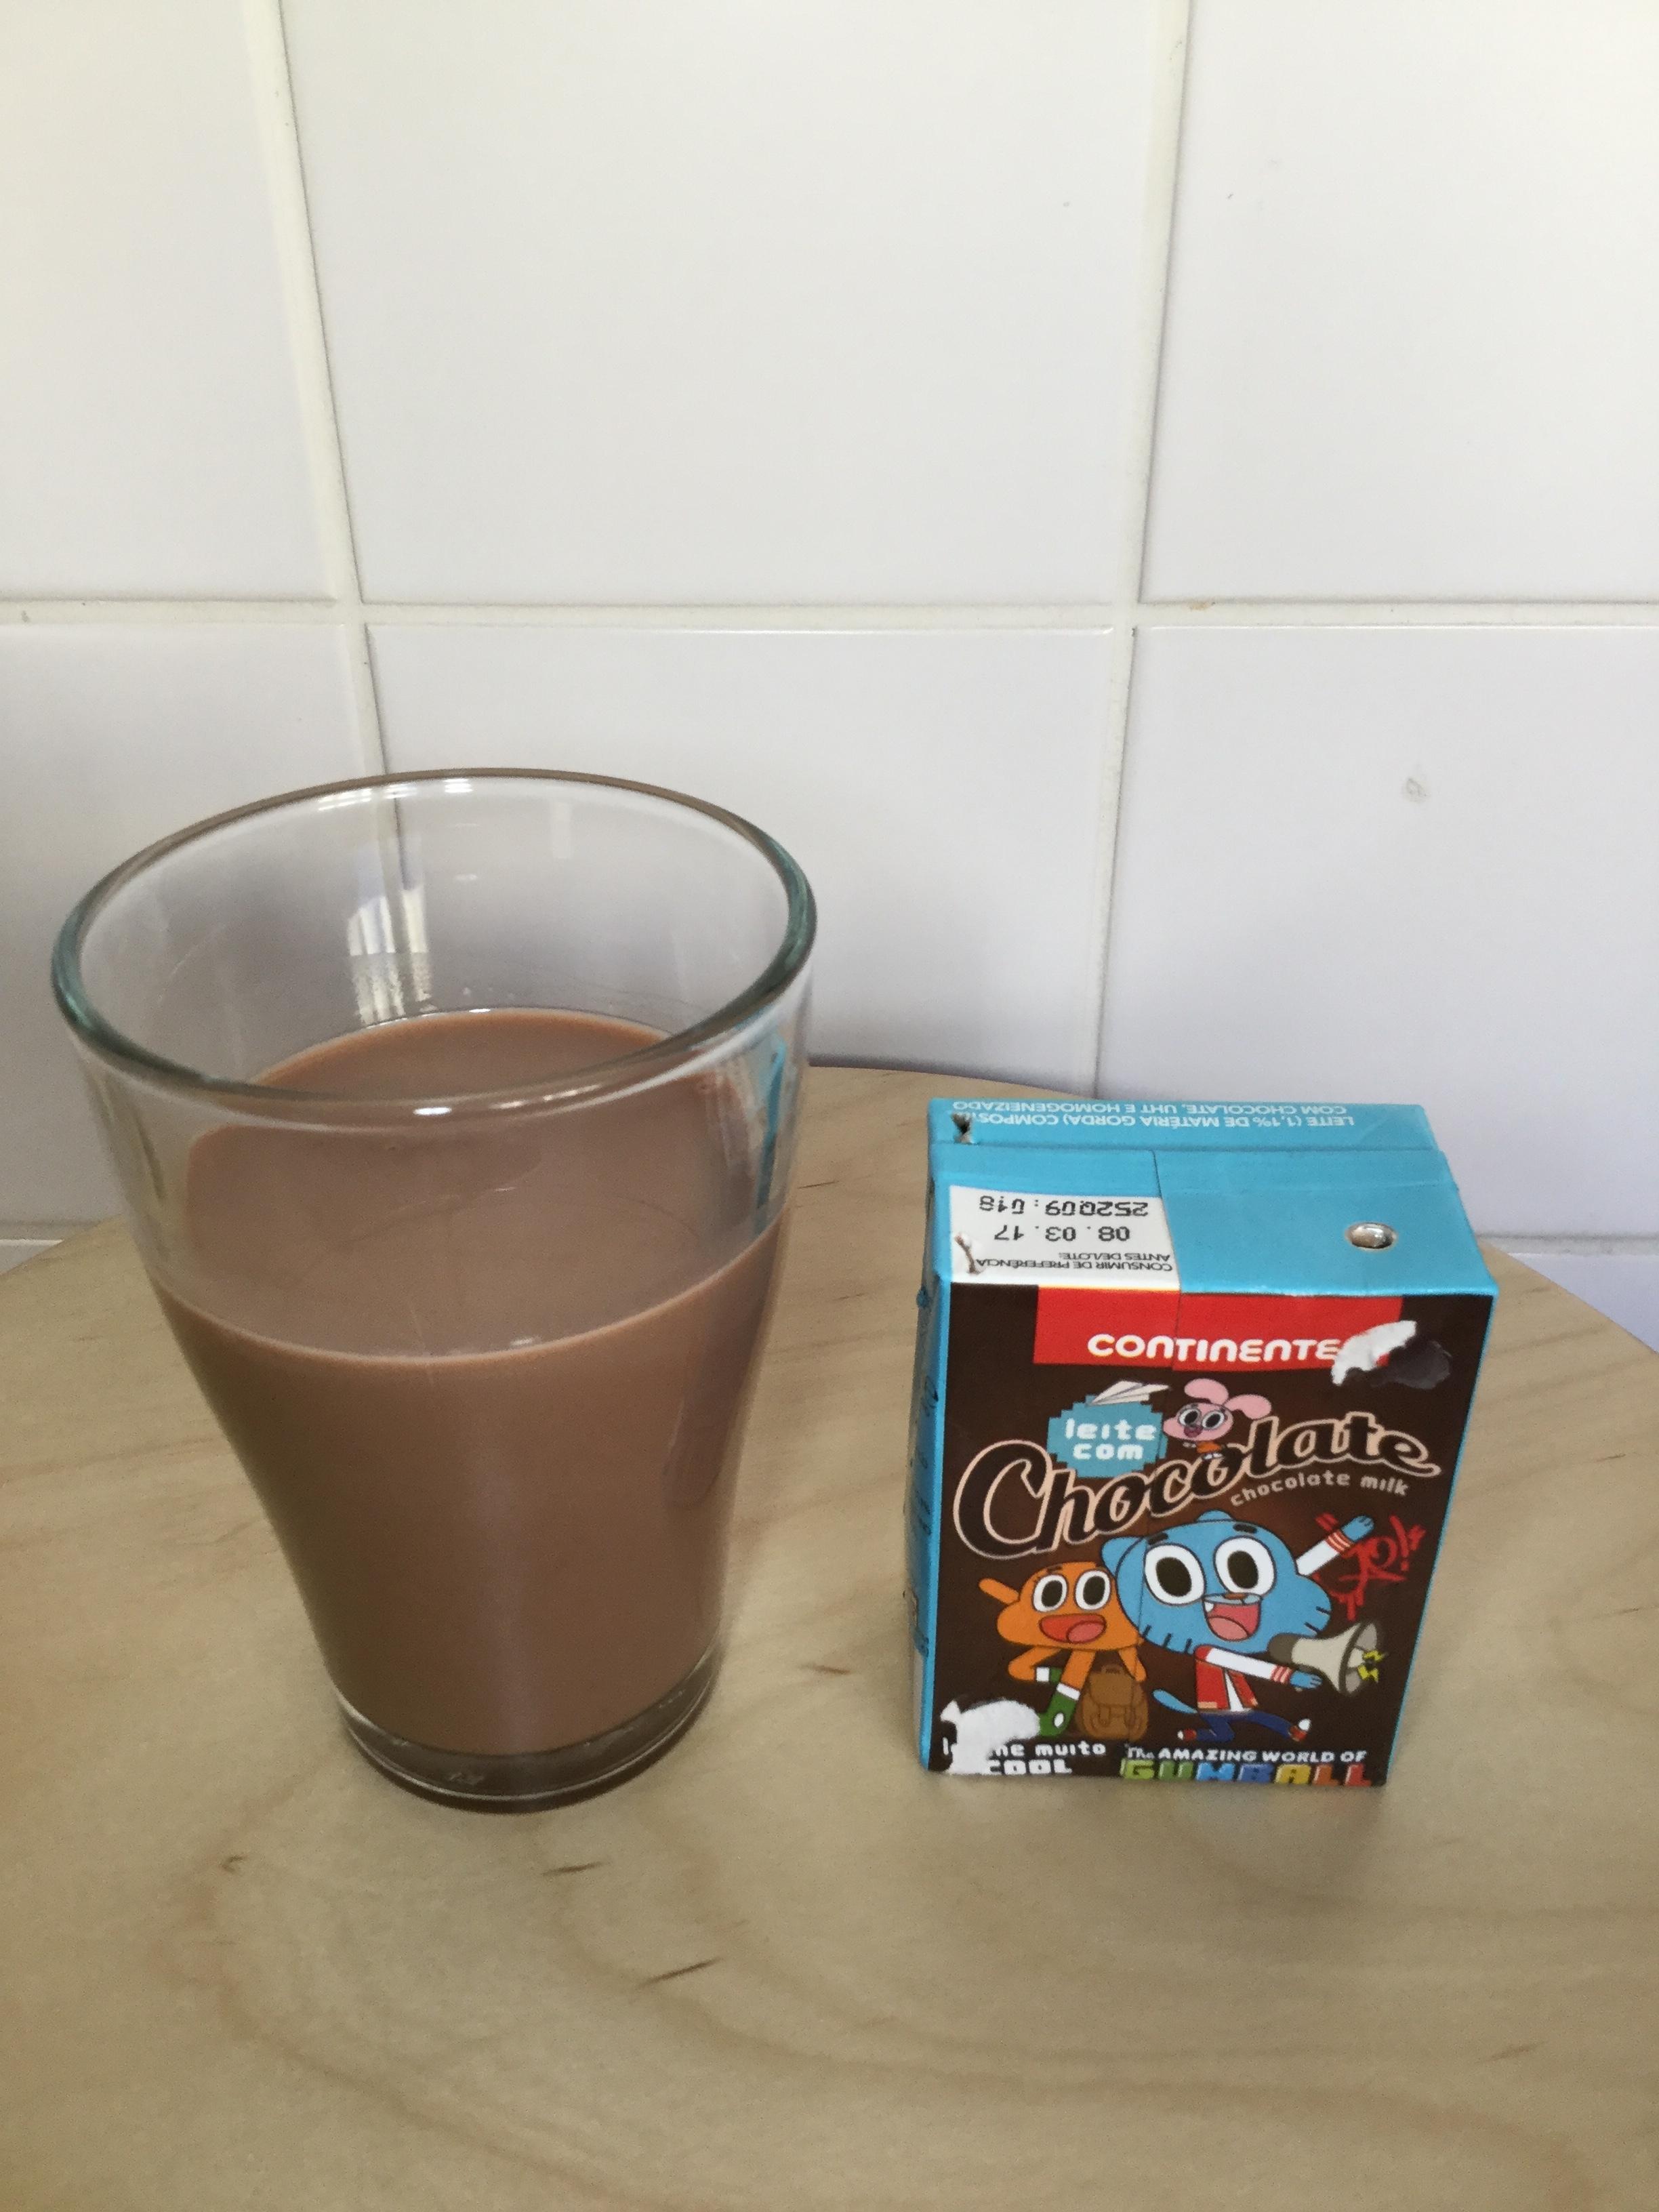 Continente Leite Com Chocolate Cup